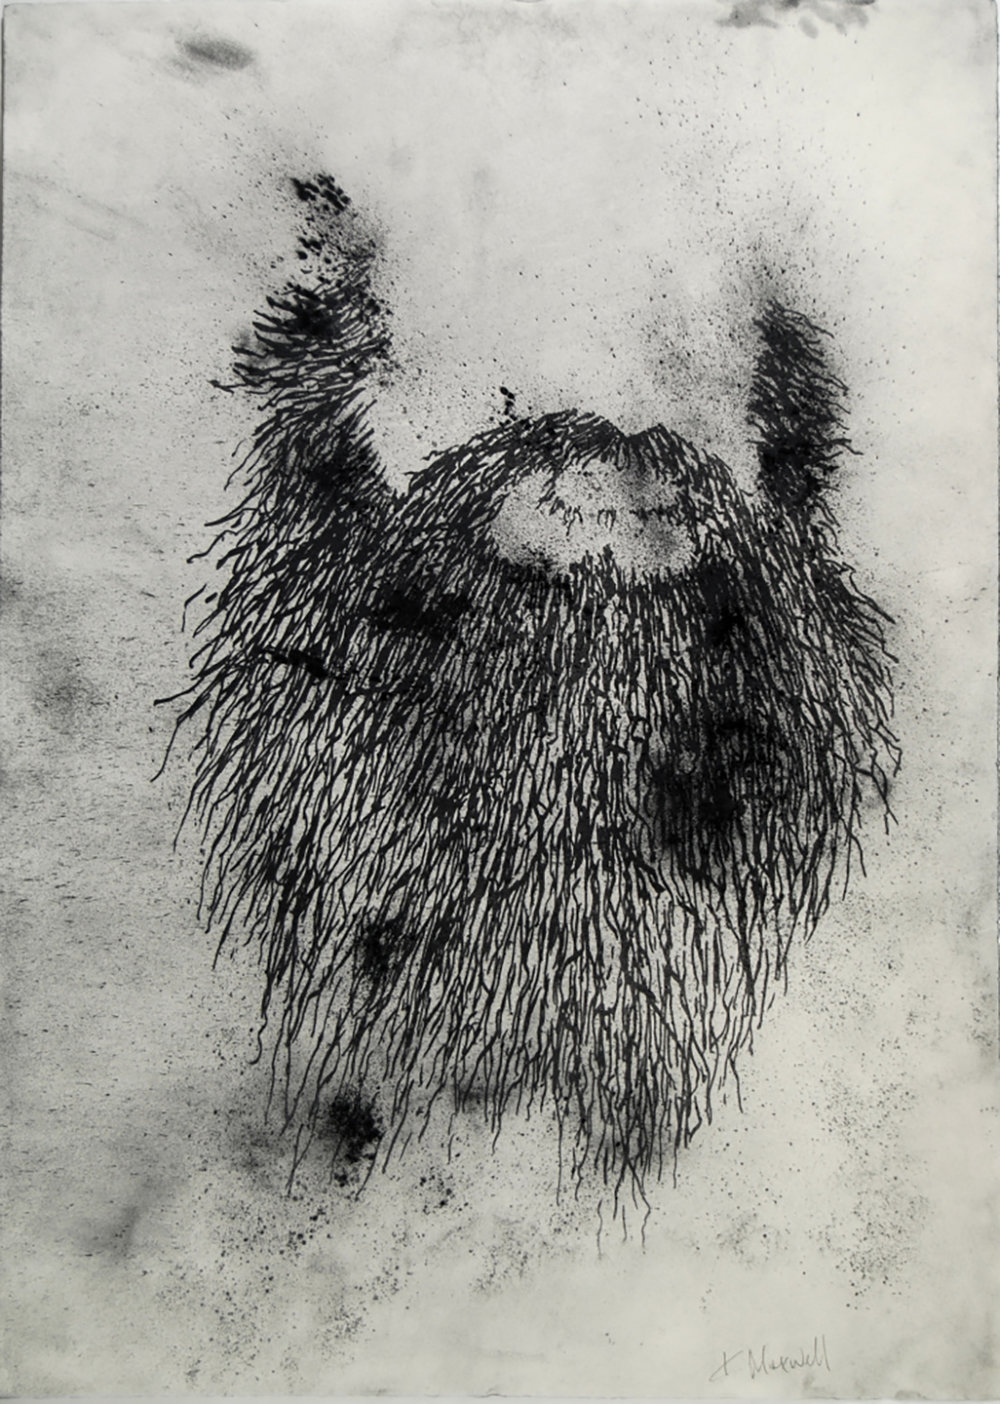 Famous Facial Hair: Rasputin